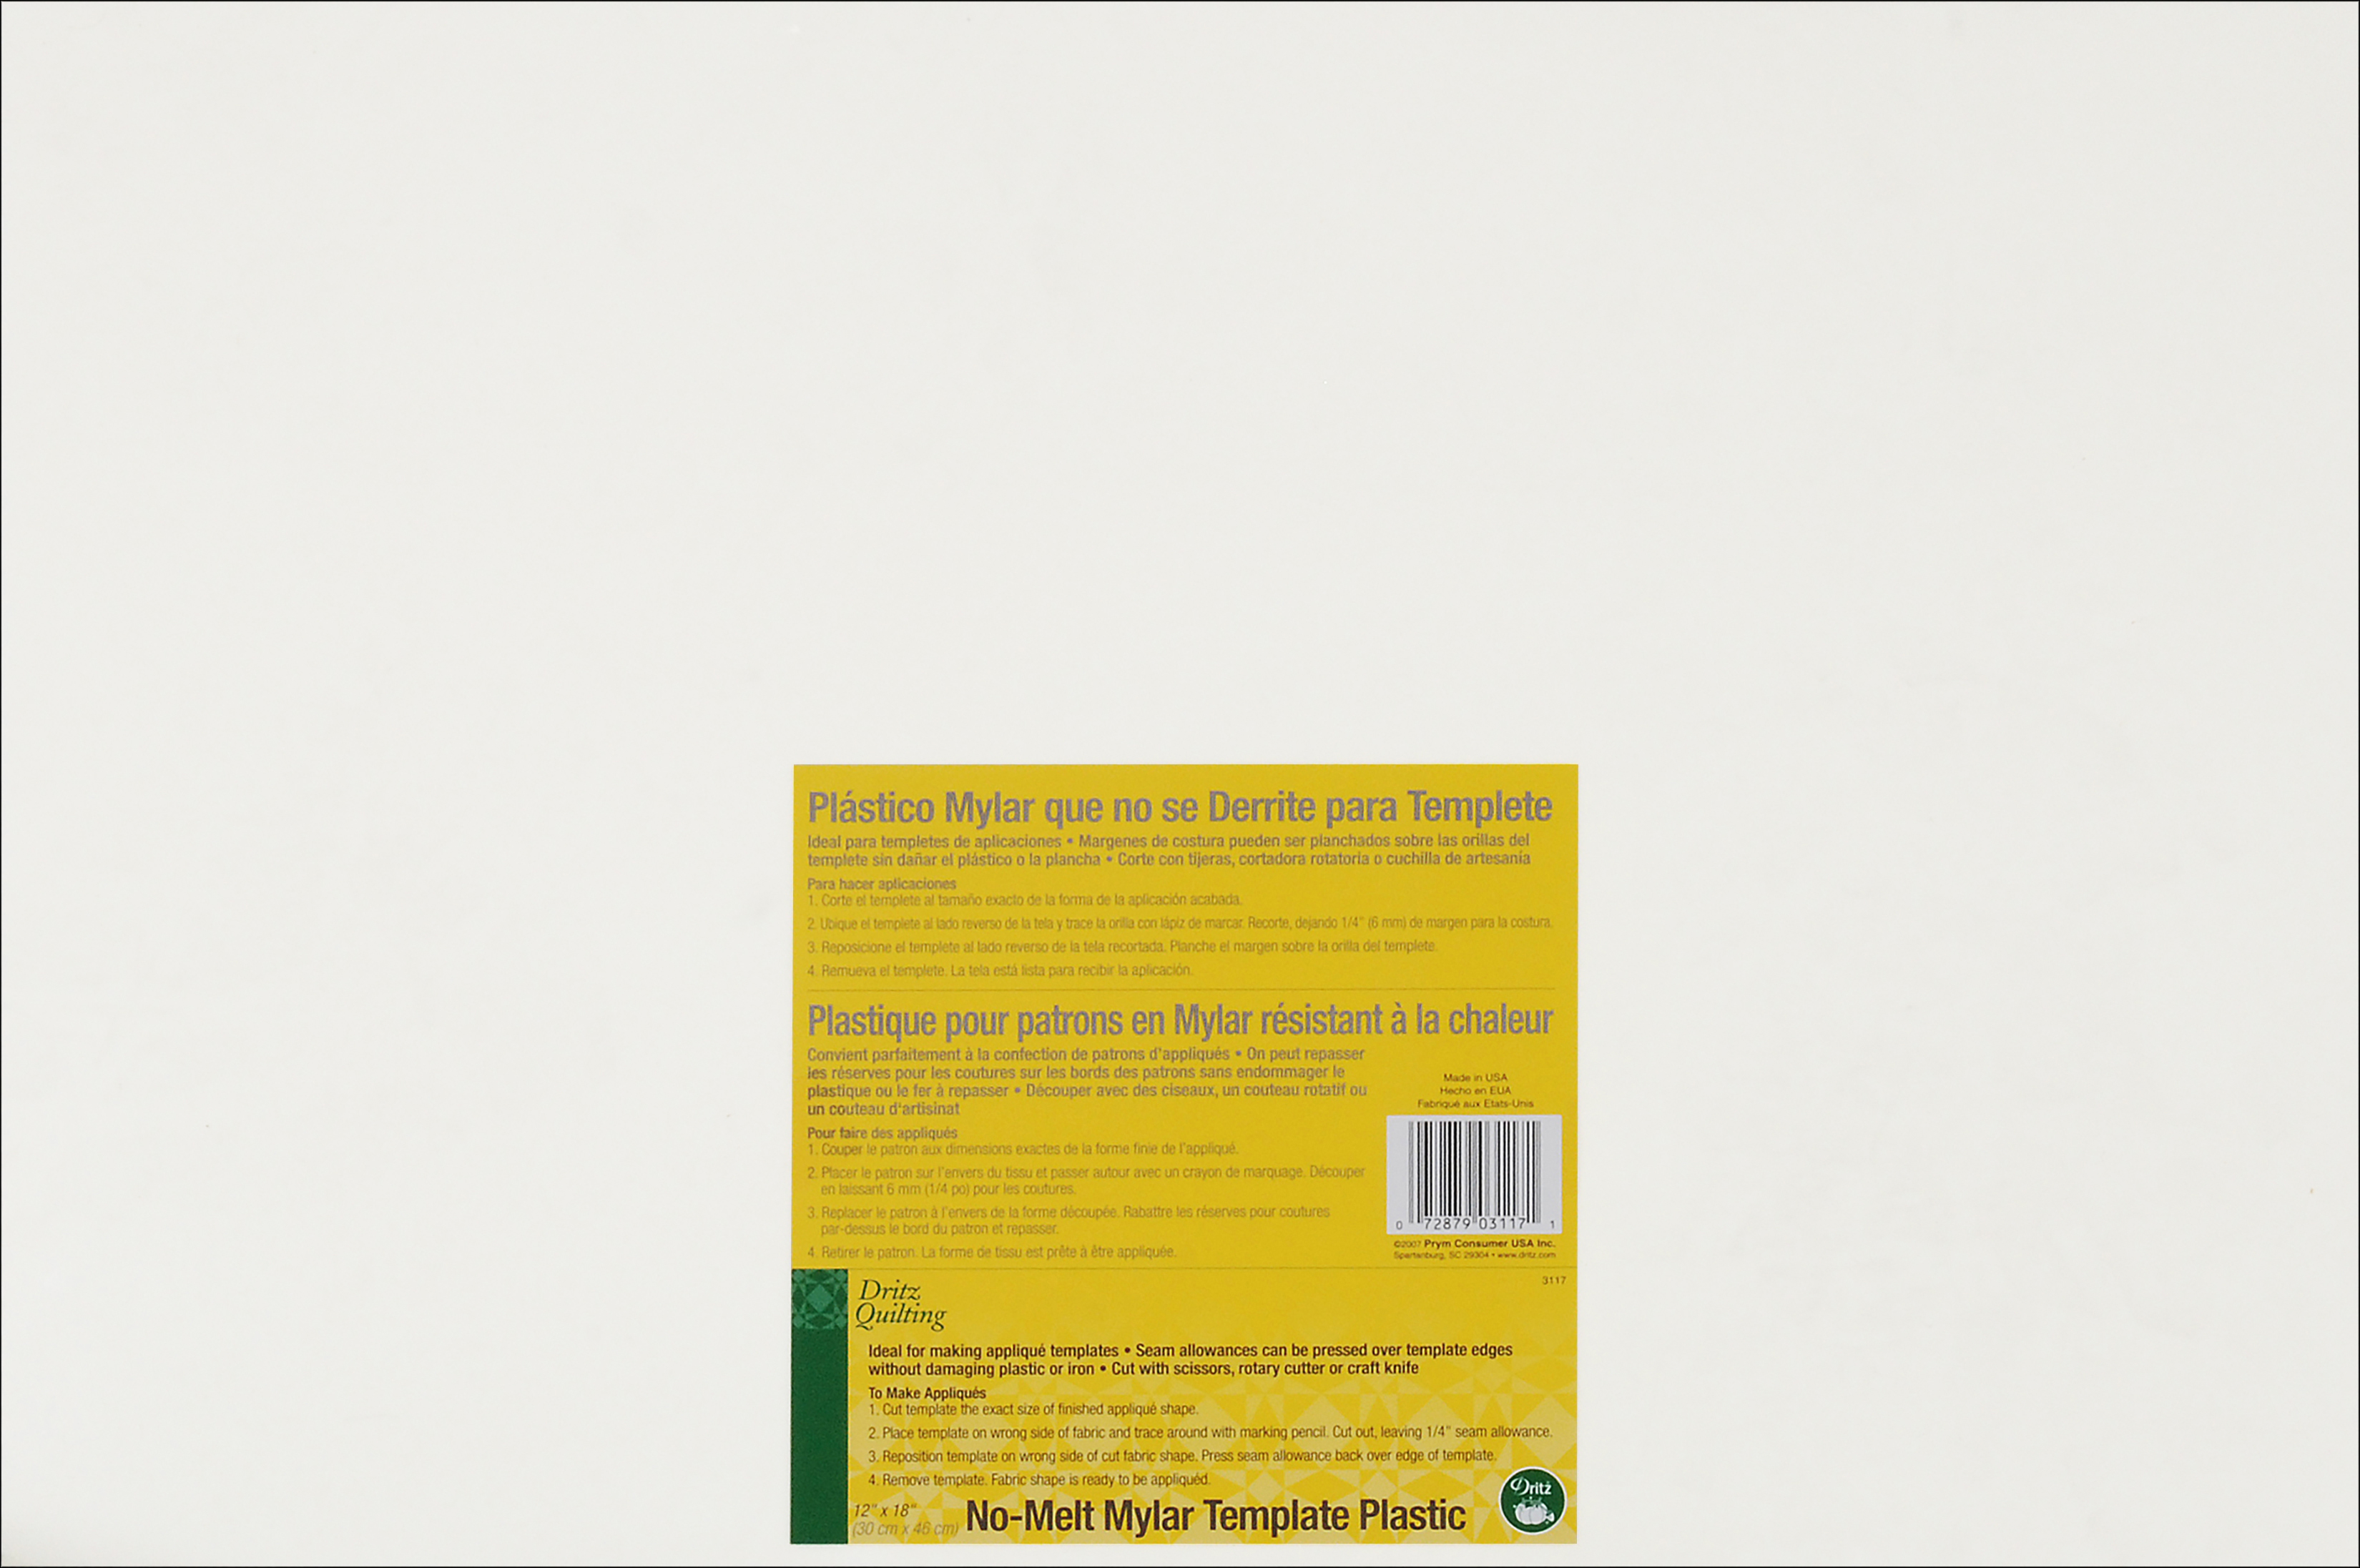 Dritz Quilting No-Melt Mylar Plastic Template-12X8